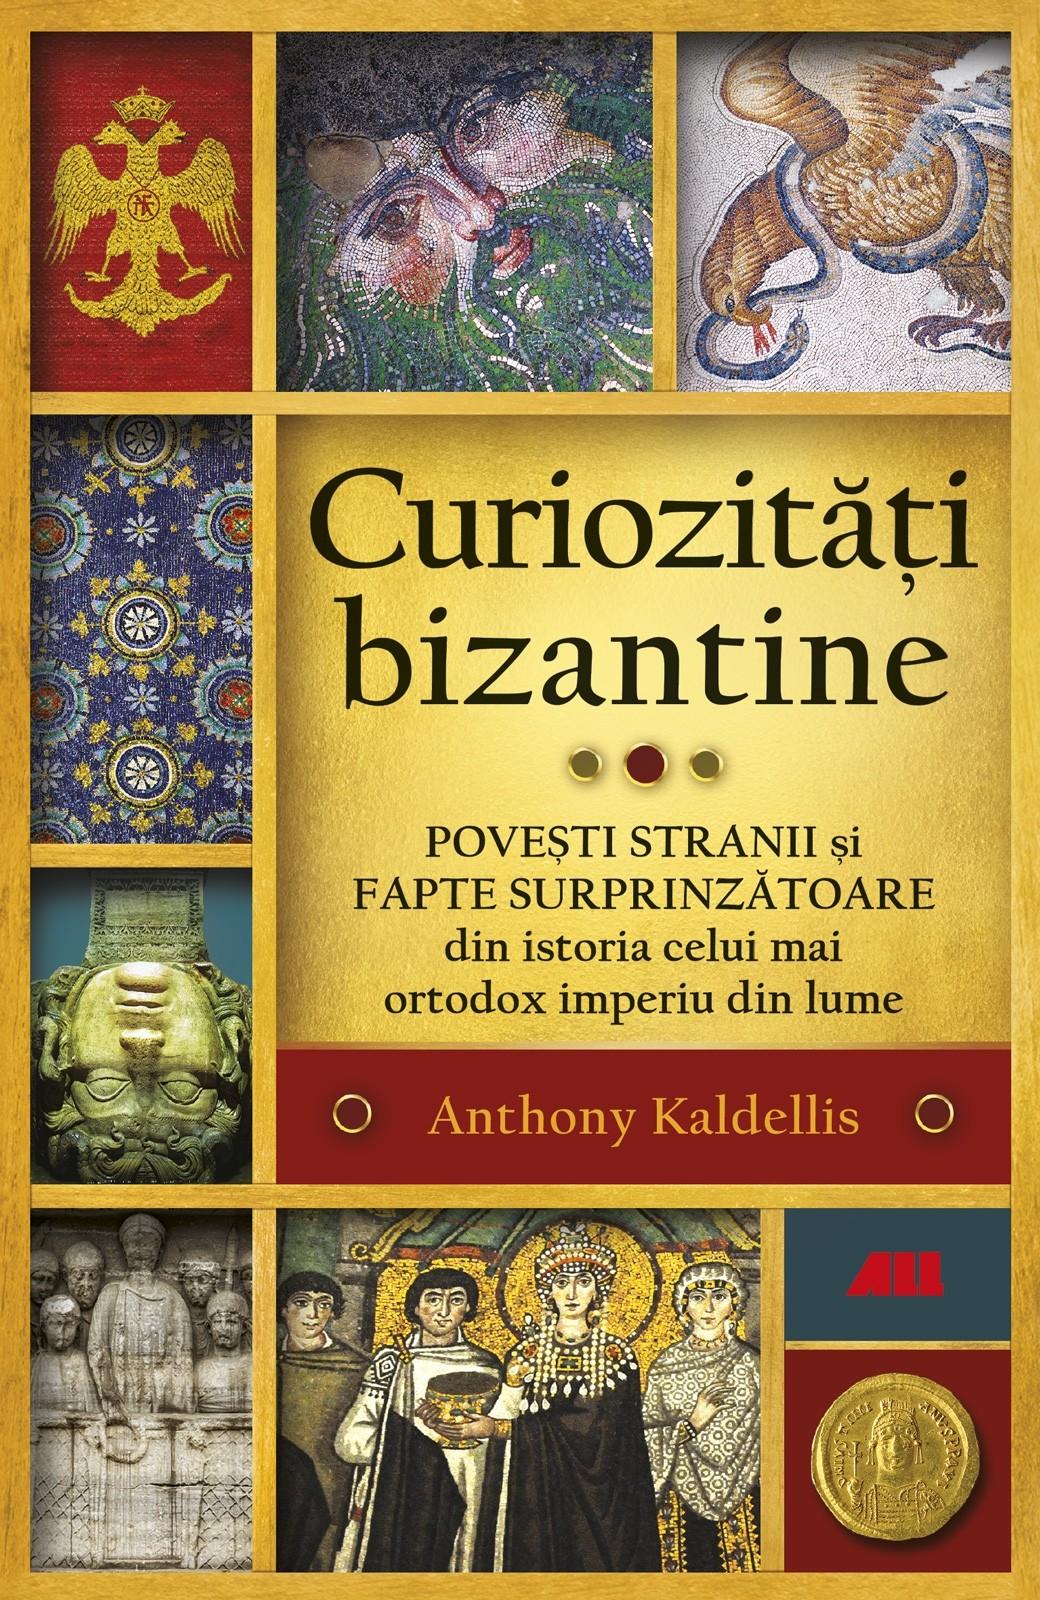 Curiozitati bizantine | Anthony Kaldelli